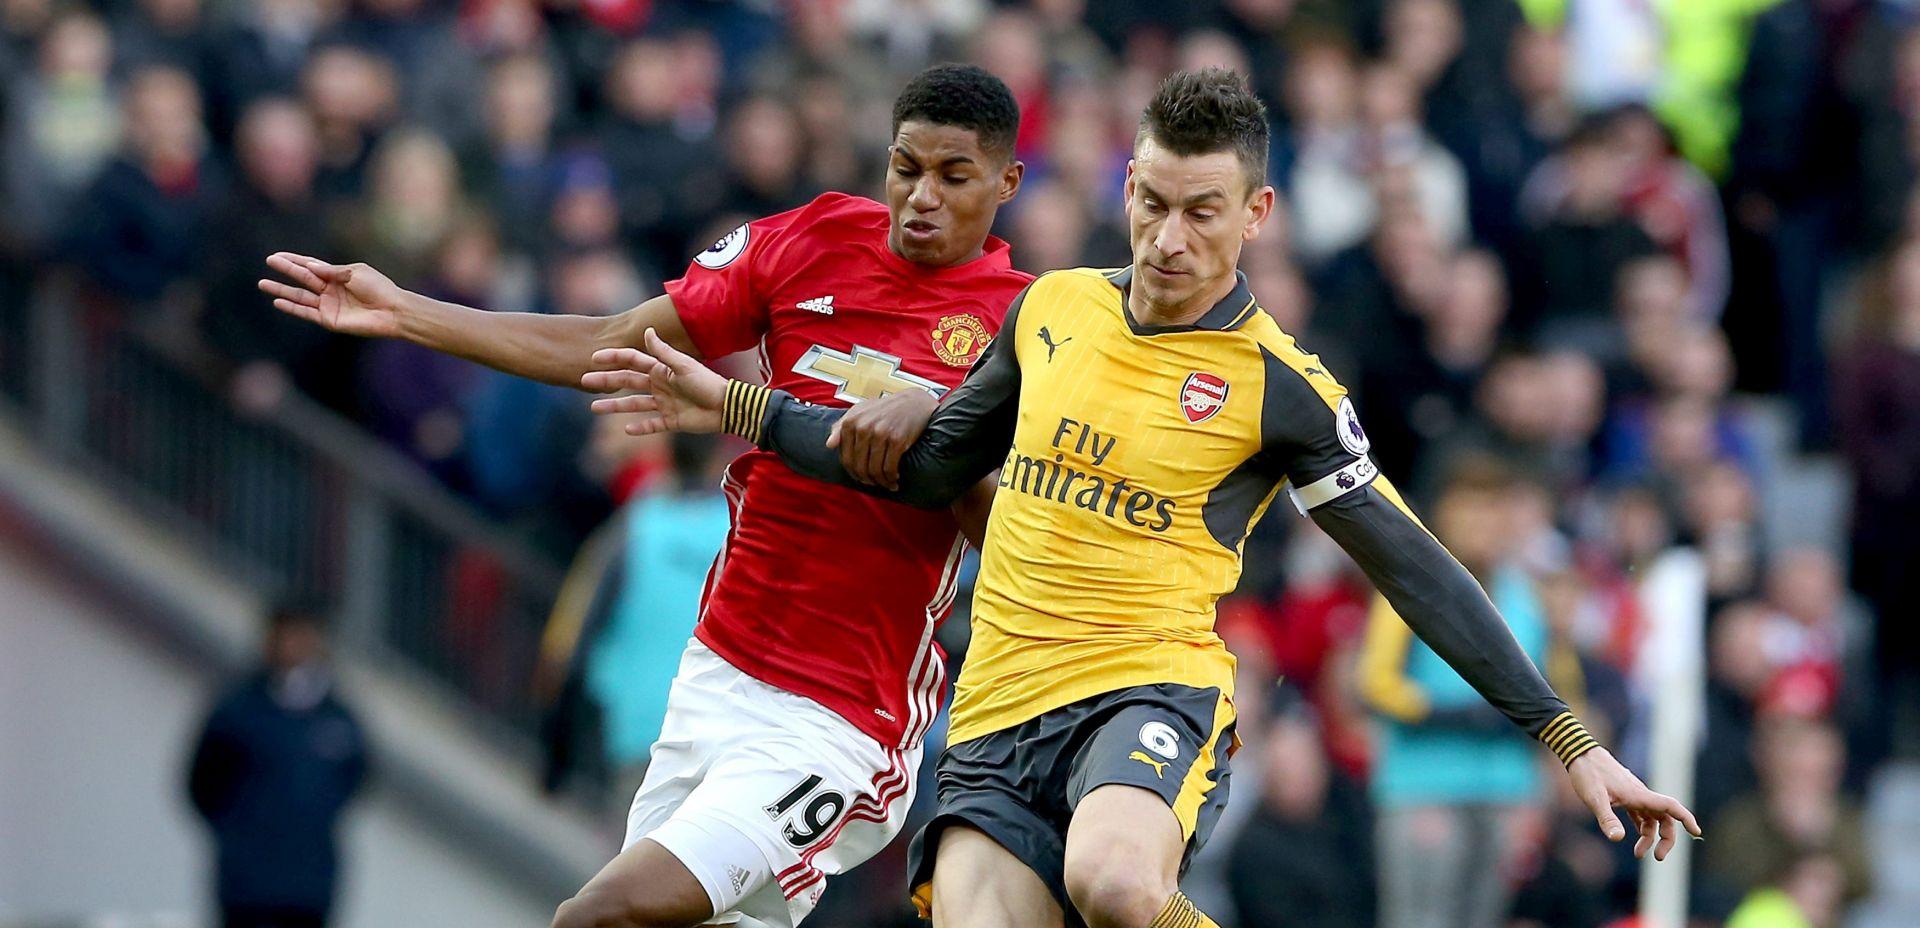 PREMIERLIGA Arsenal spasio bod kod Uniteda u 89. minuti